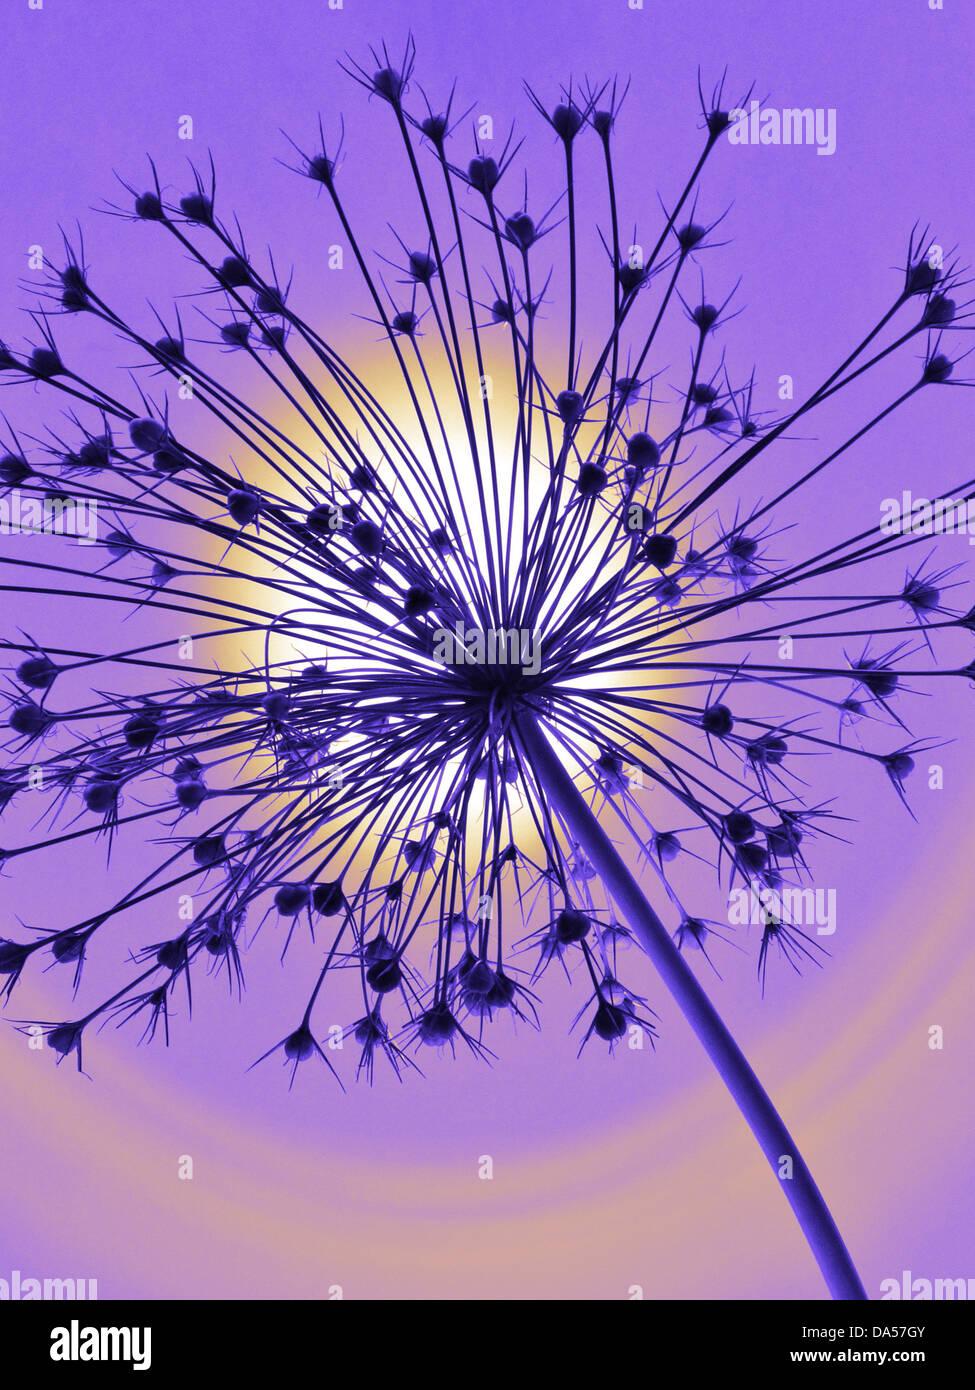 Blume, verwelkt, Allium, Konzept, Stern, Konzepte, Stern, hellblau, entfremdet Stockbild